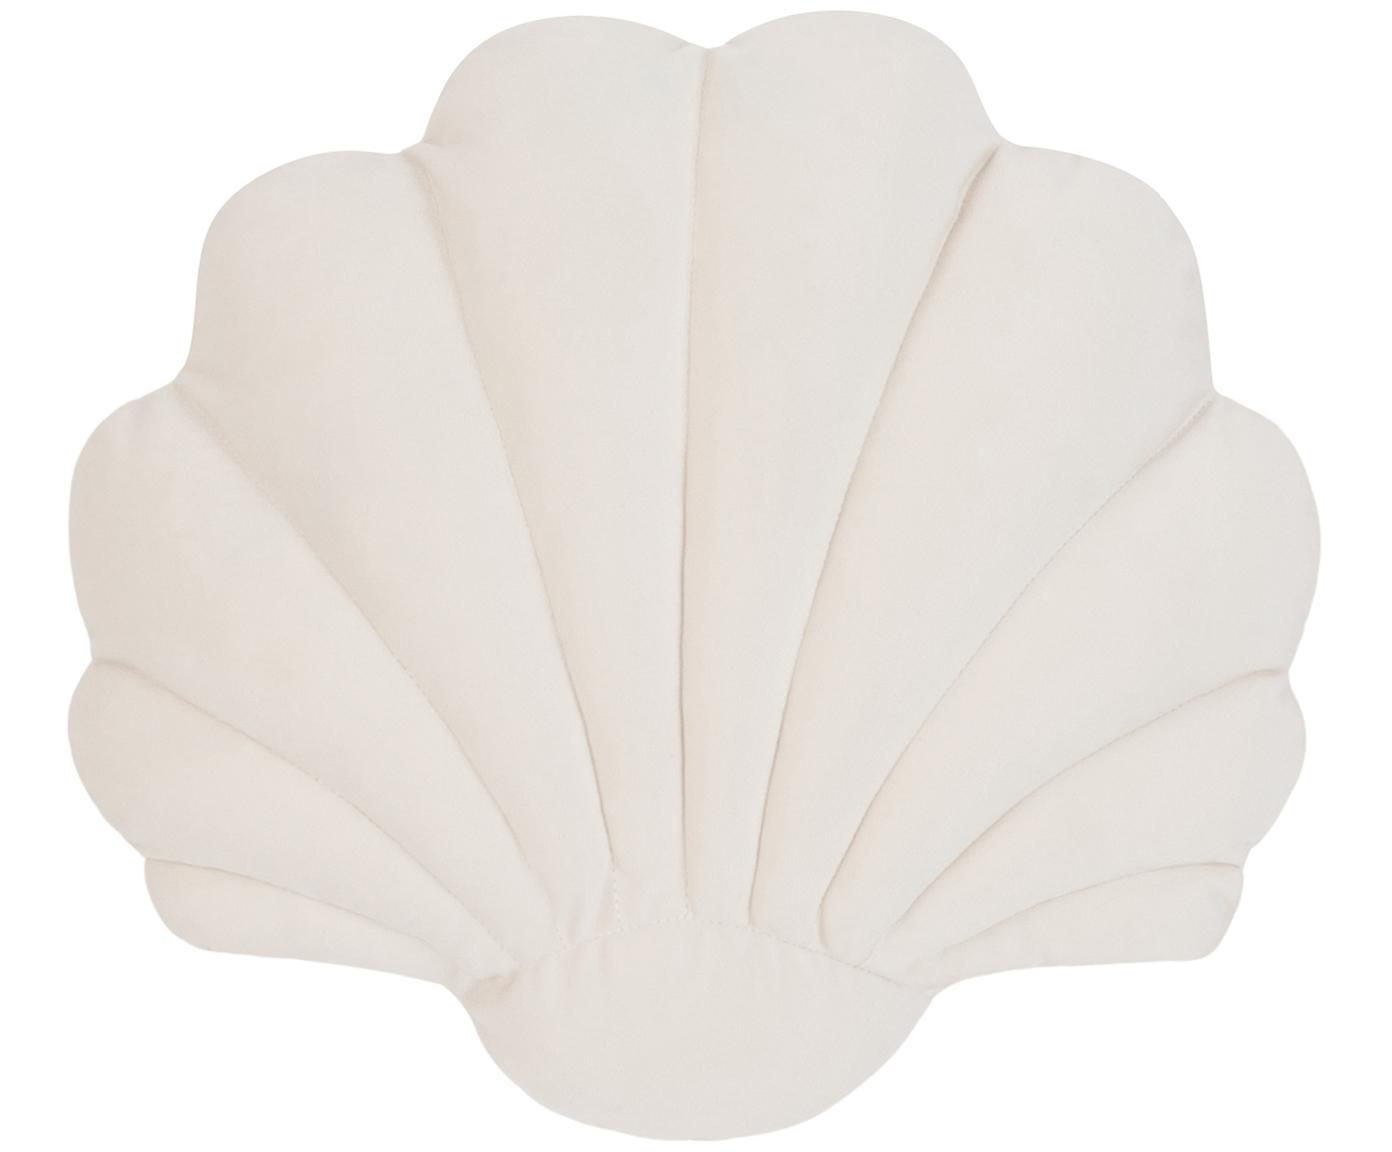 Kussen Shell, Crèmewit, 28 x 30 cm